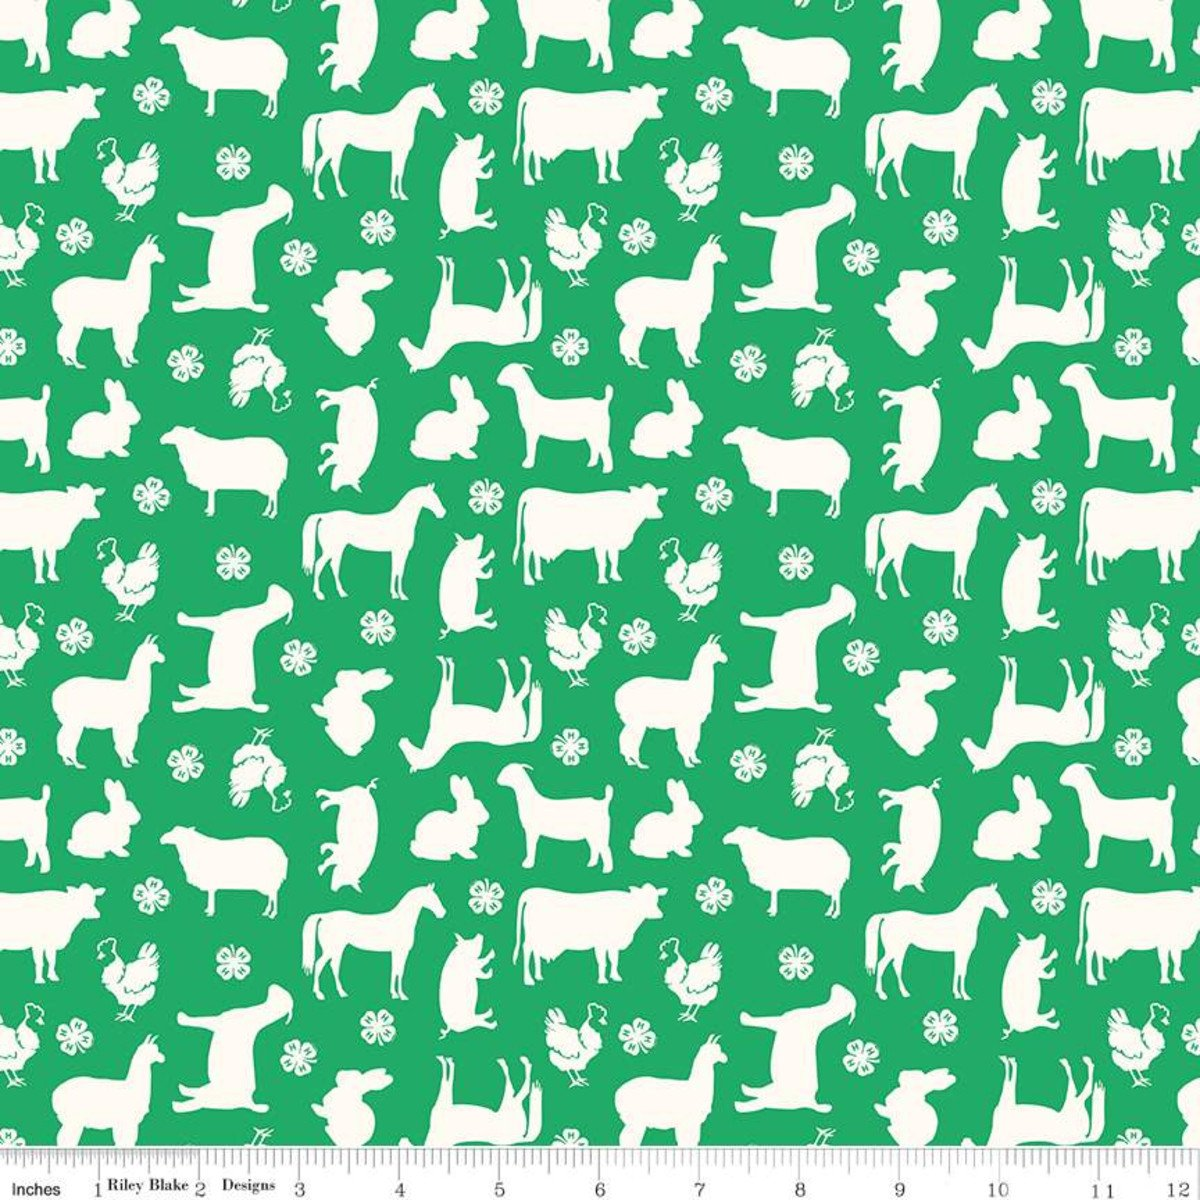 4-H Main Green C9120-Green